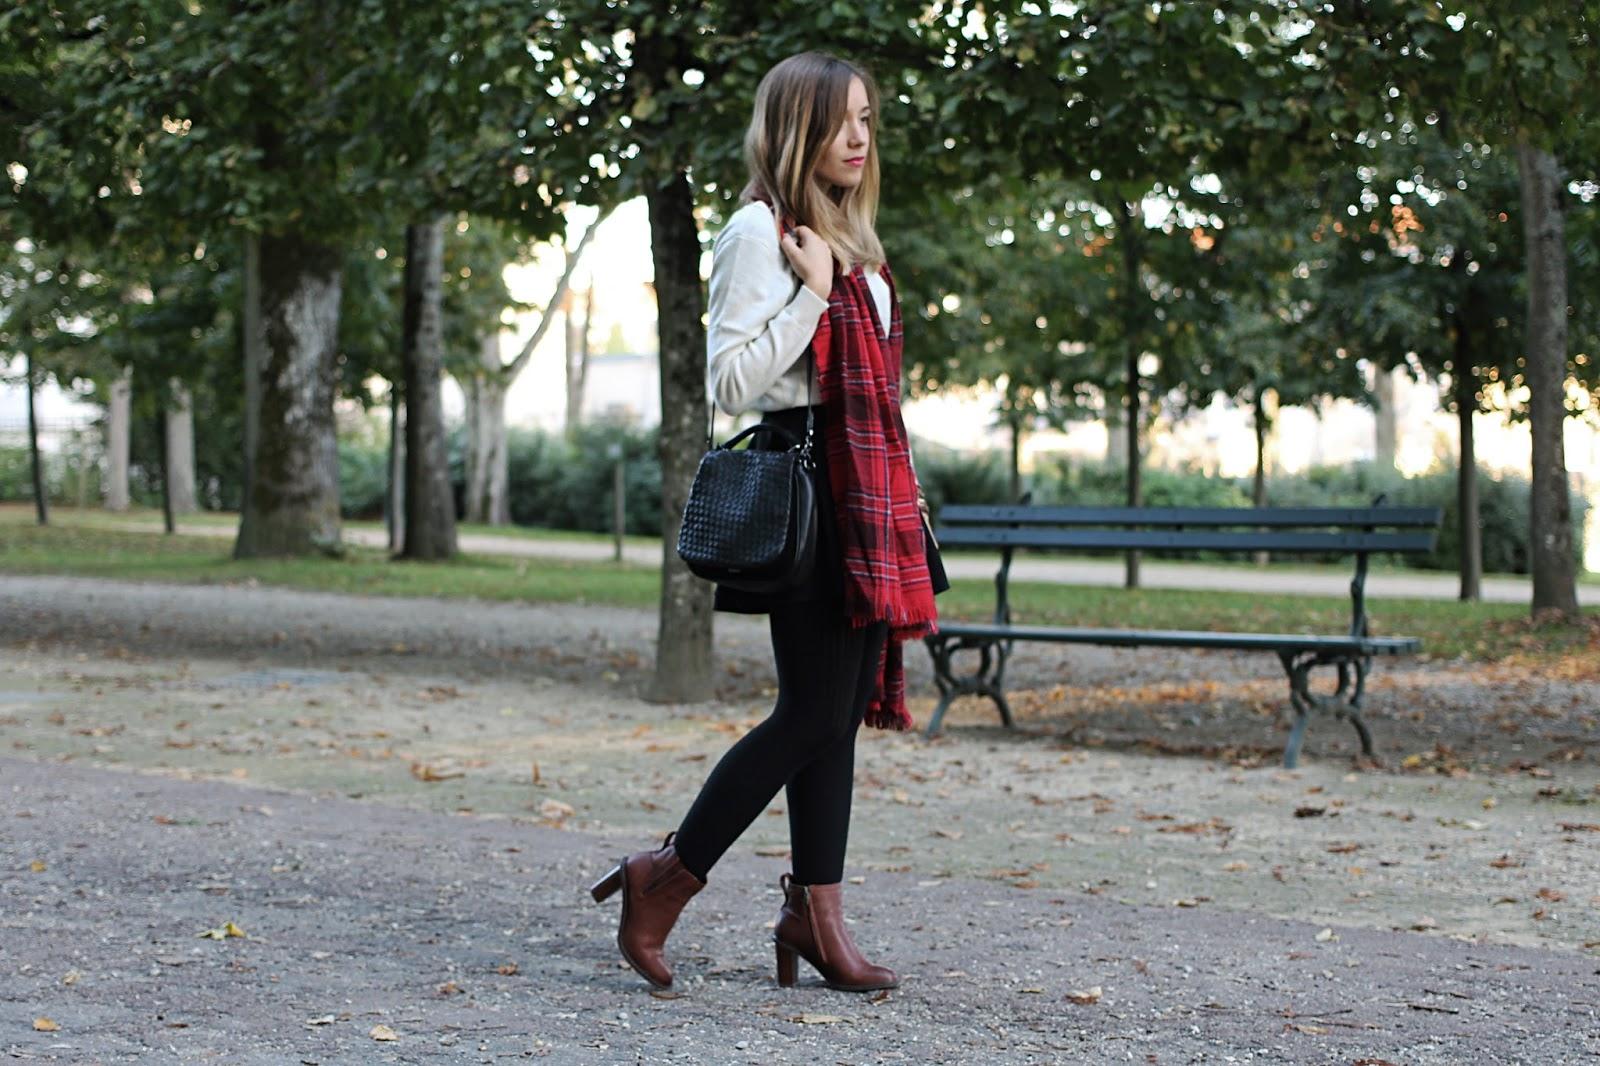 Tenue automne cachemire et bottines